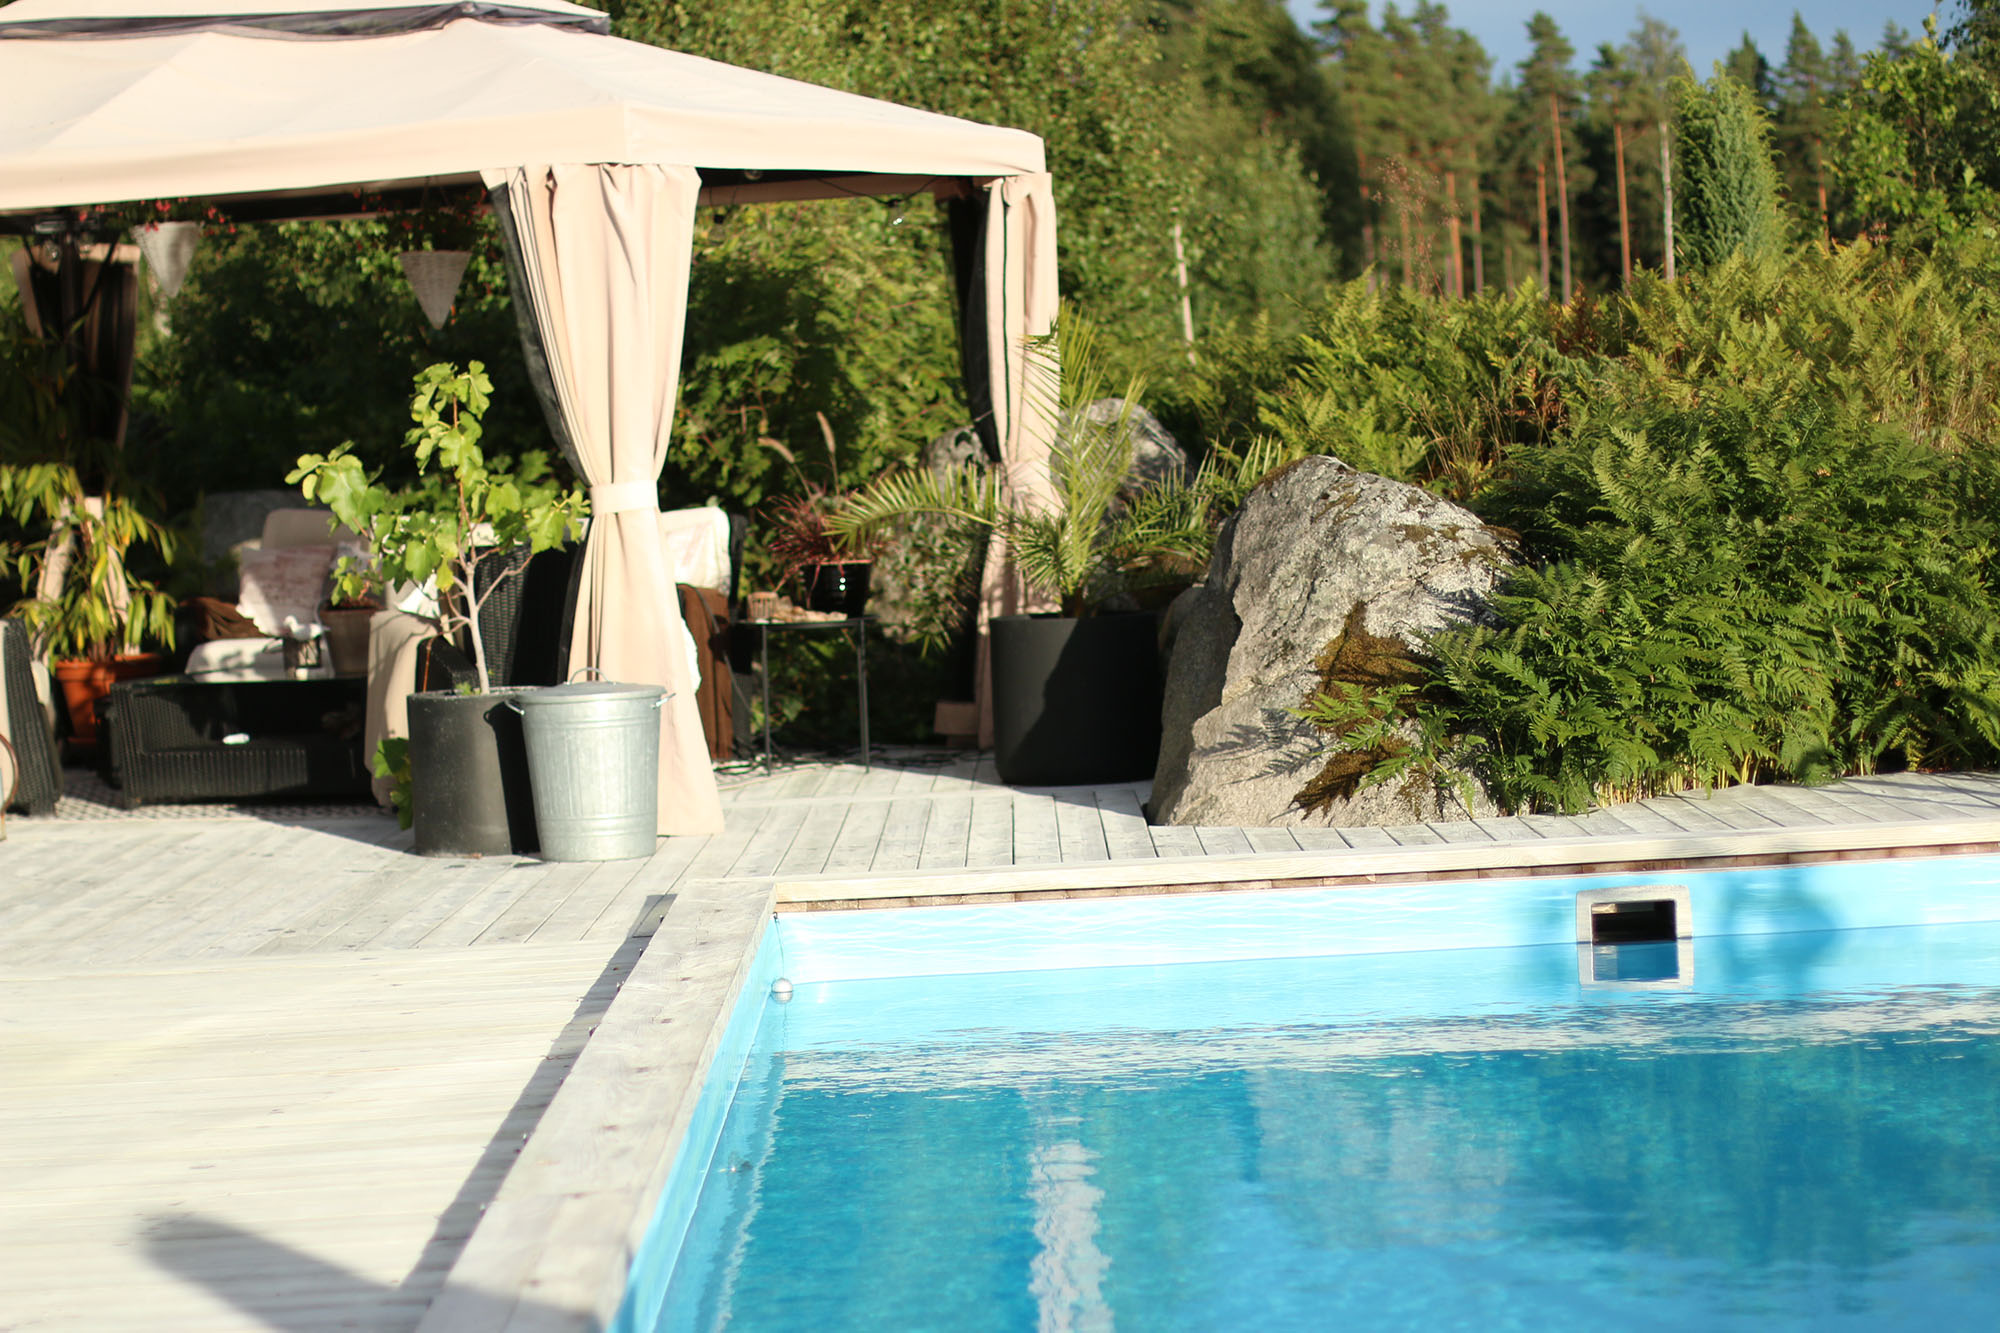 IMG_5709 pool och lounge x